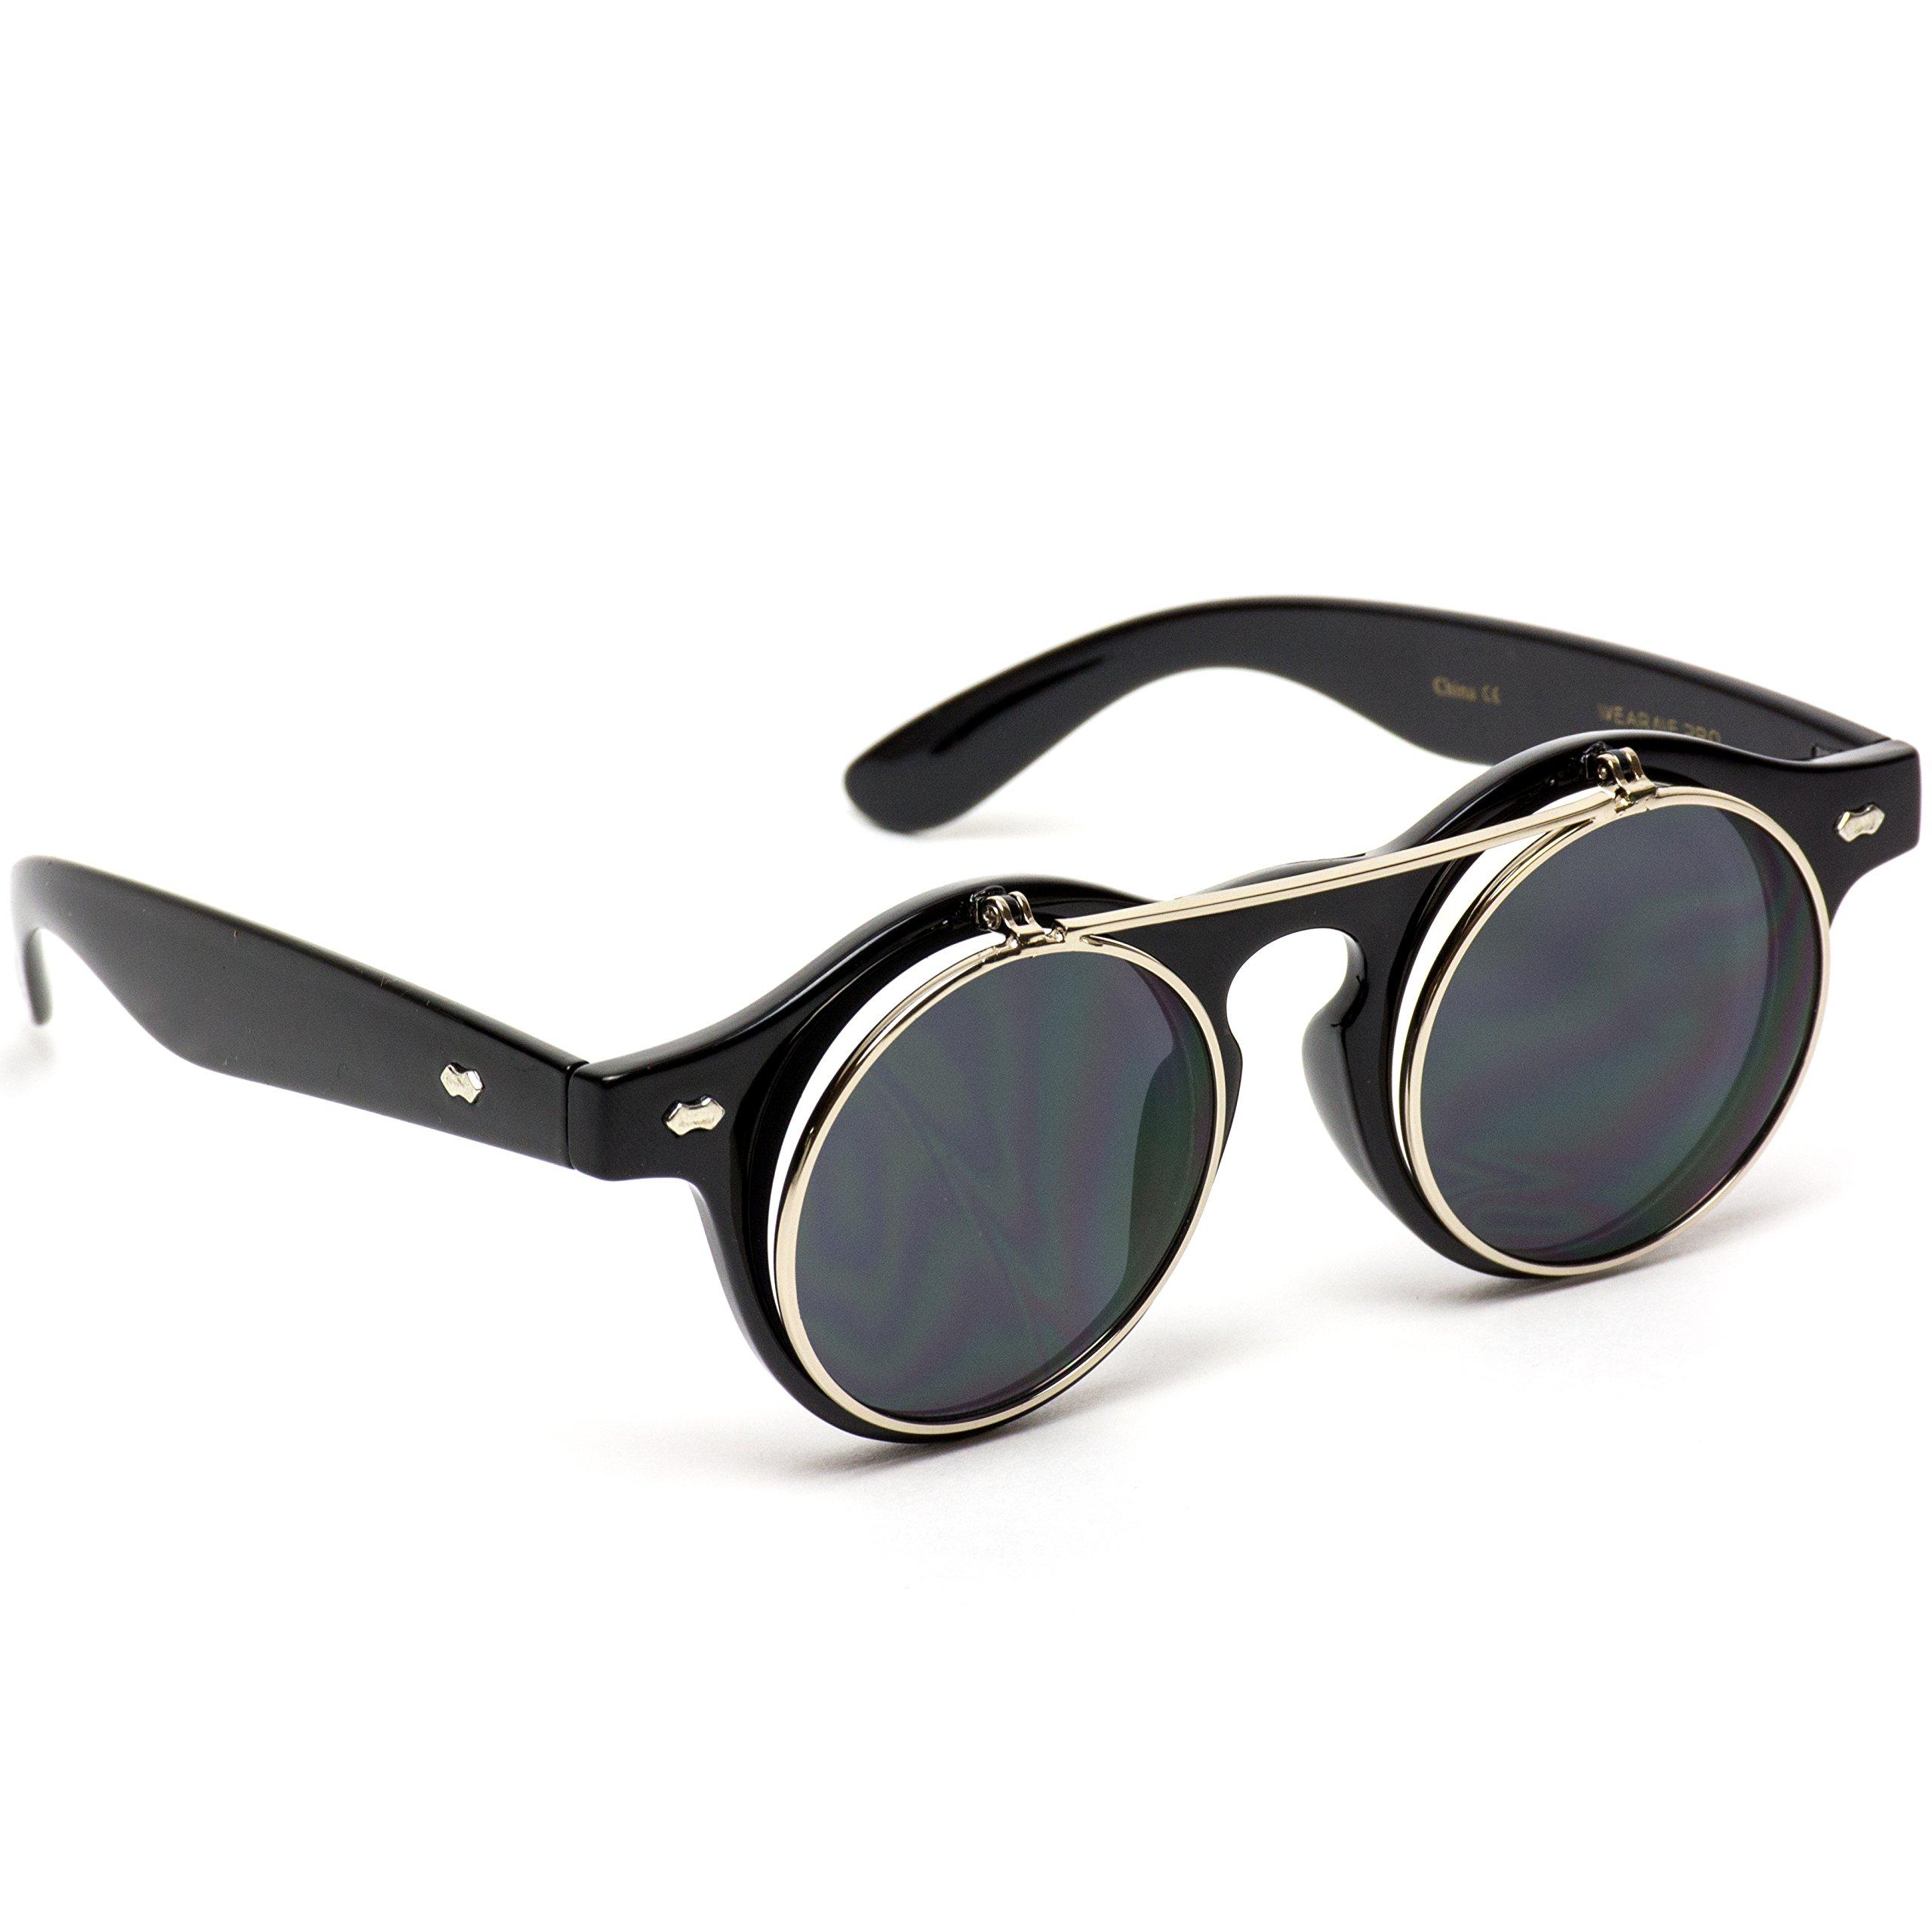 3a1d6a6efc Flip up Cyber Steampunk Round Circle Retro Sunglasses (Black Silver Rimmed